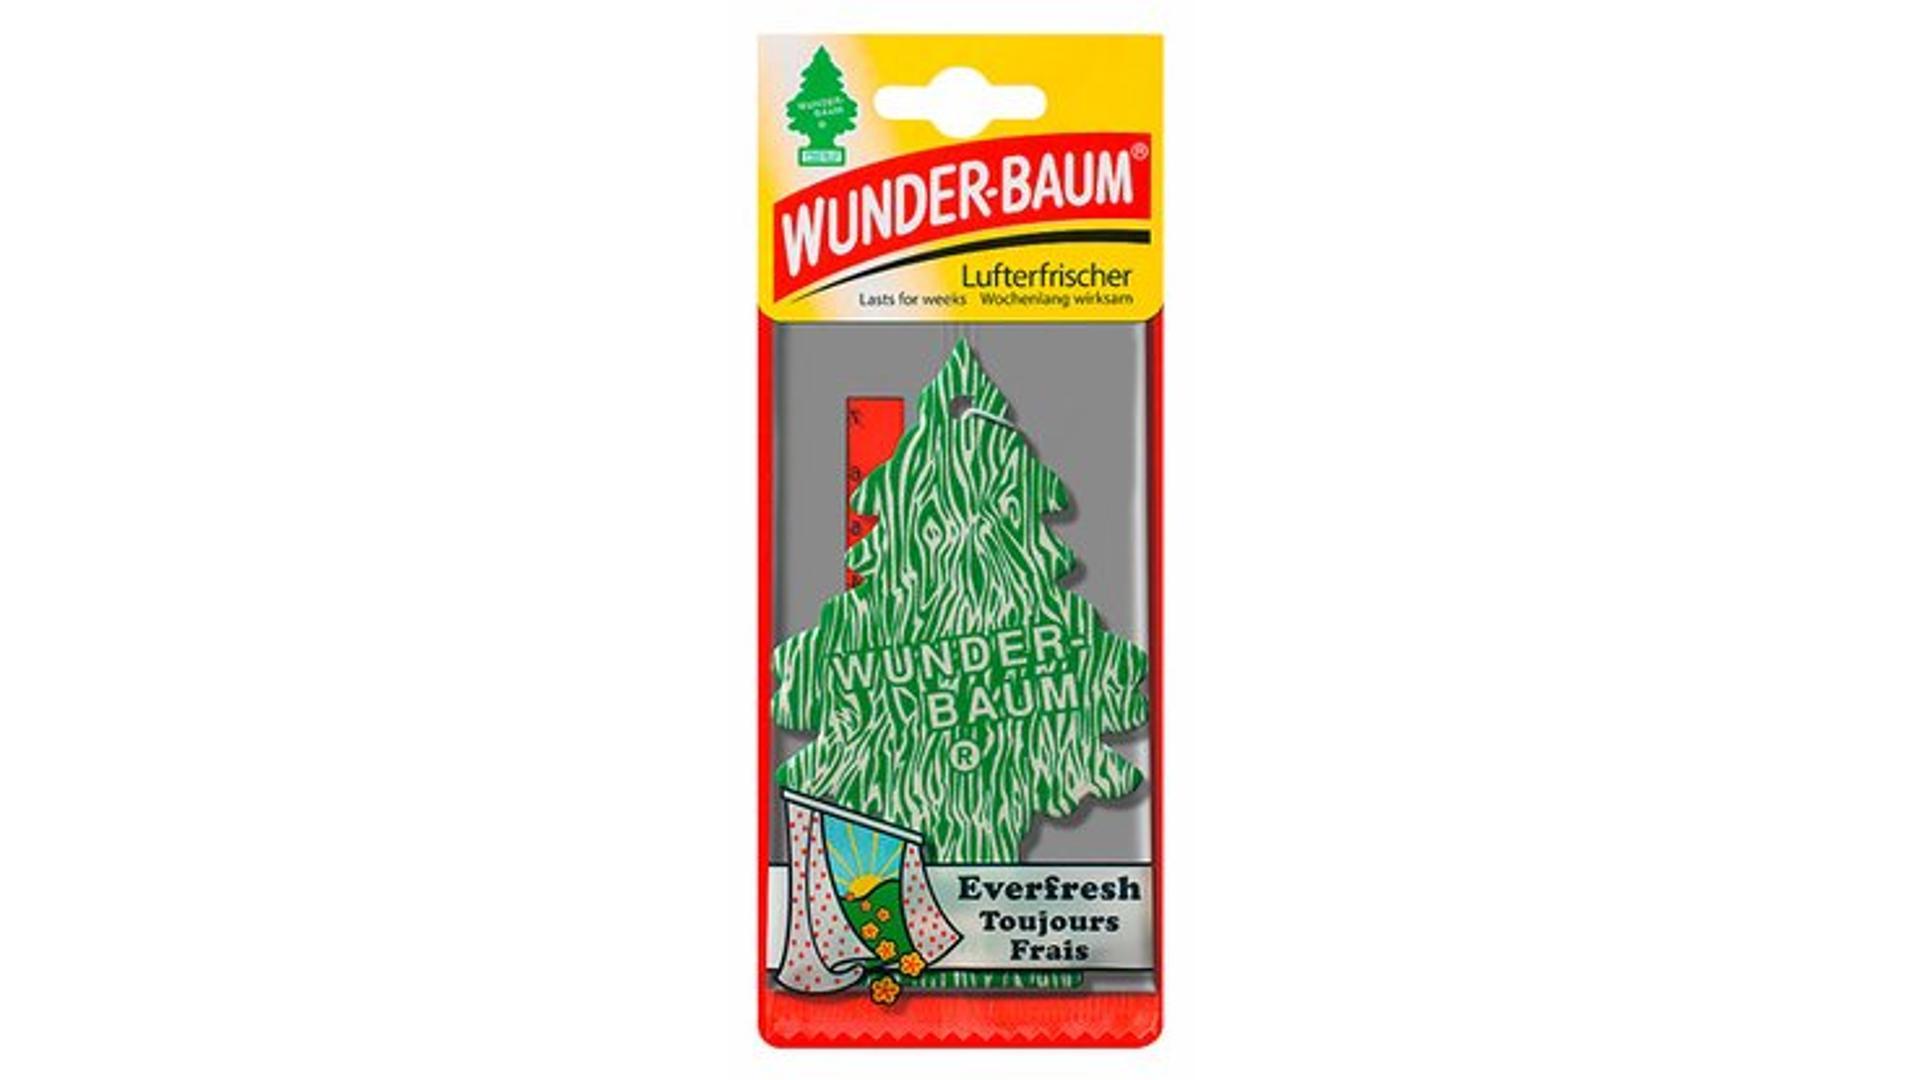 WUNDER BAUM Osvěžovač vzduchu Everfresh